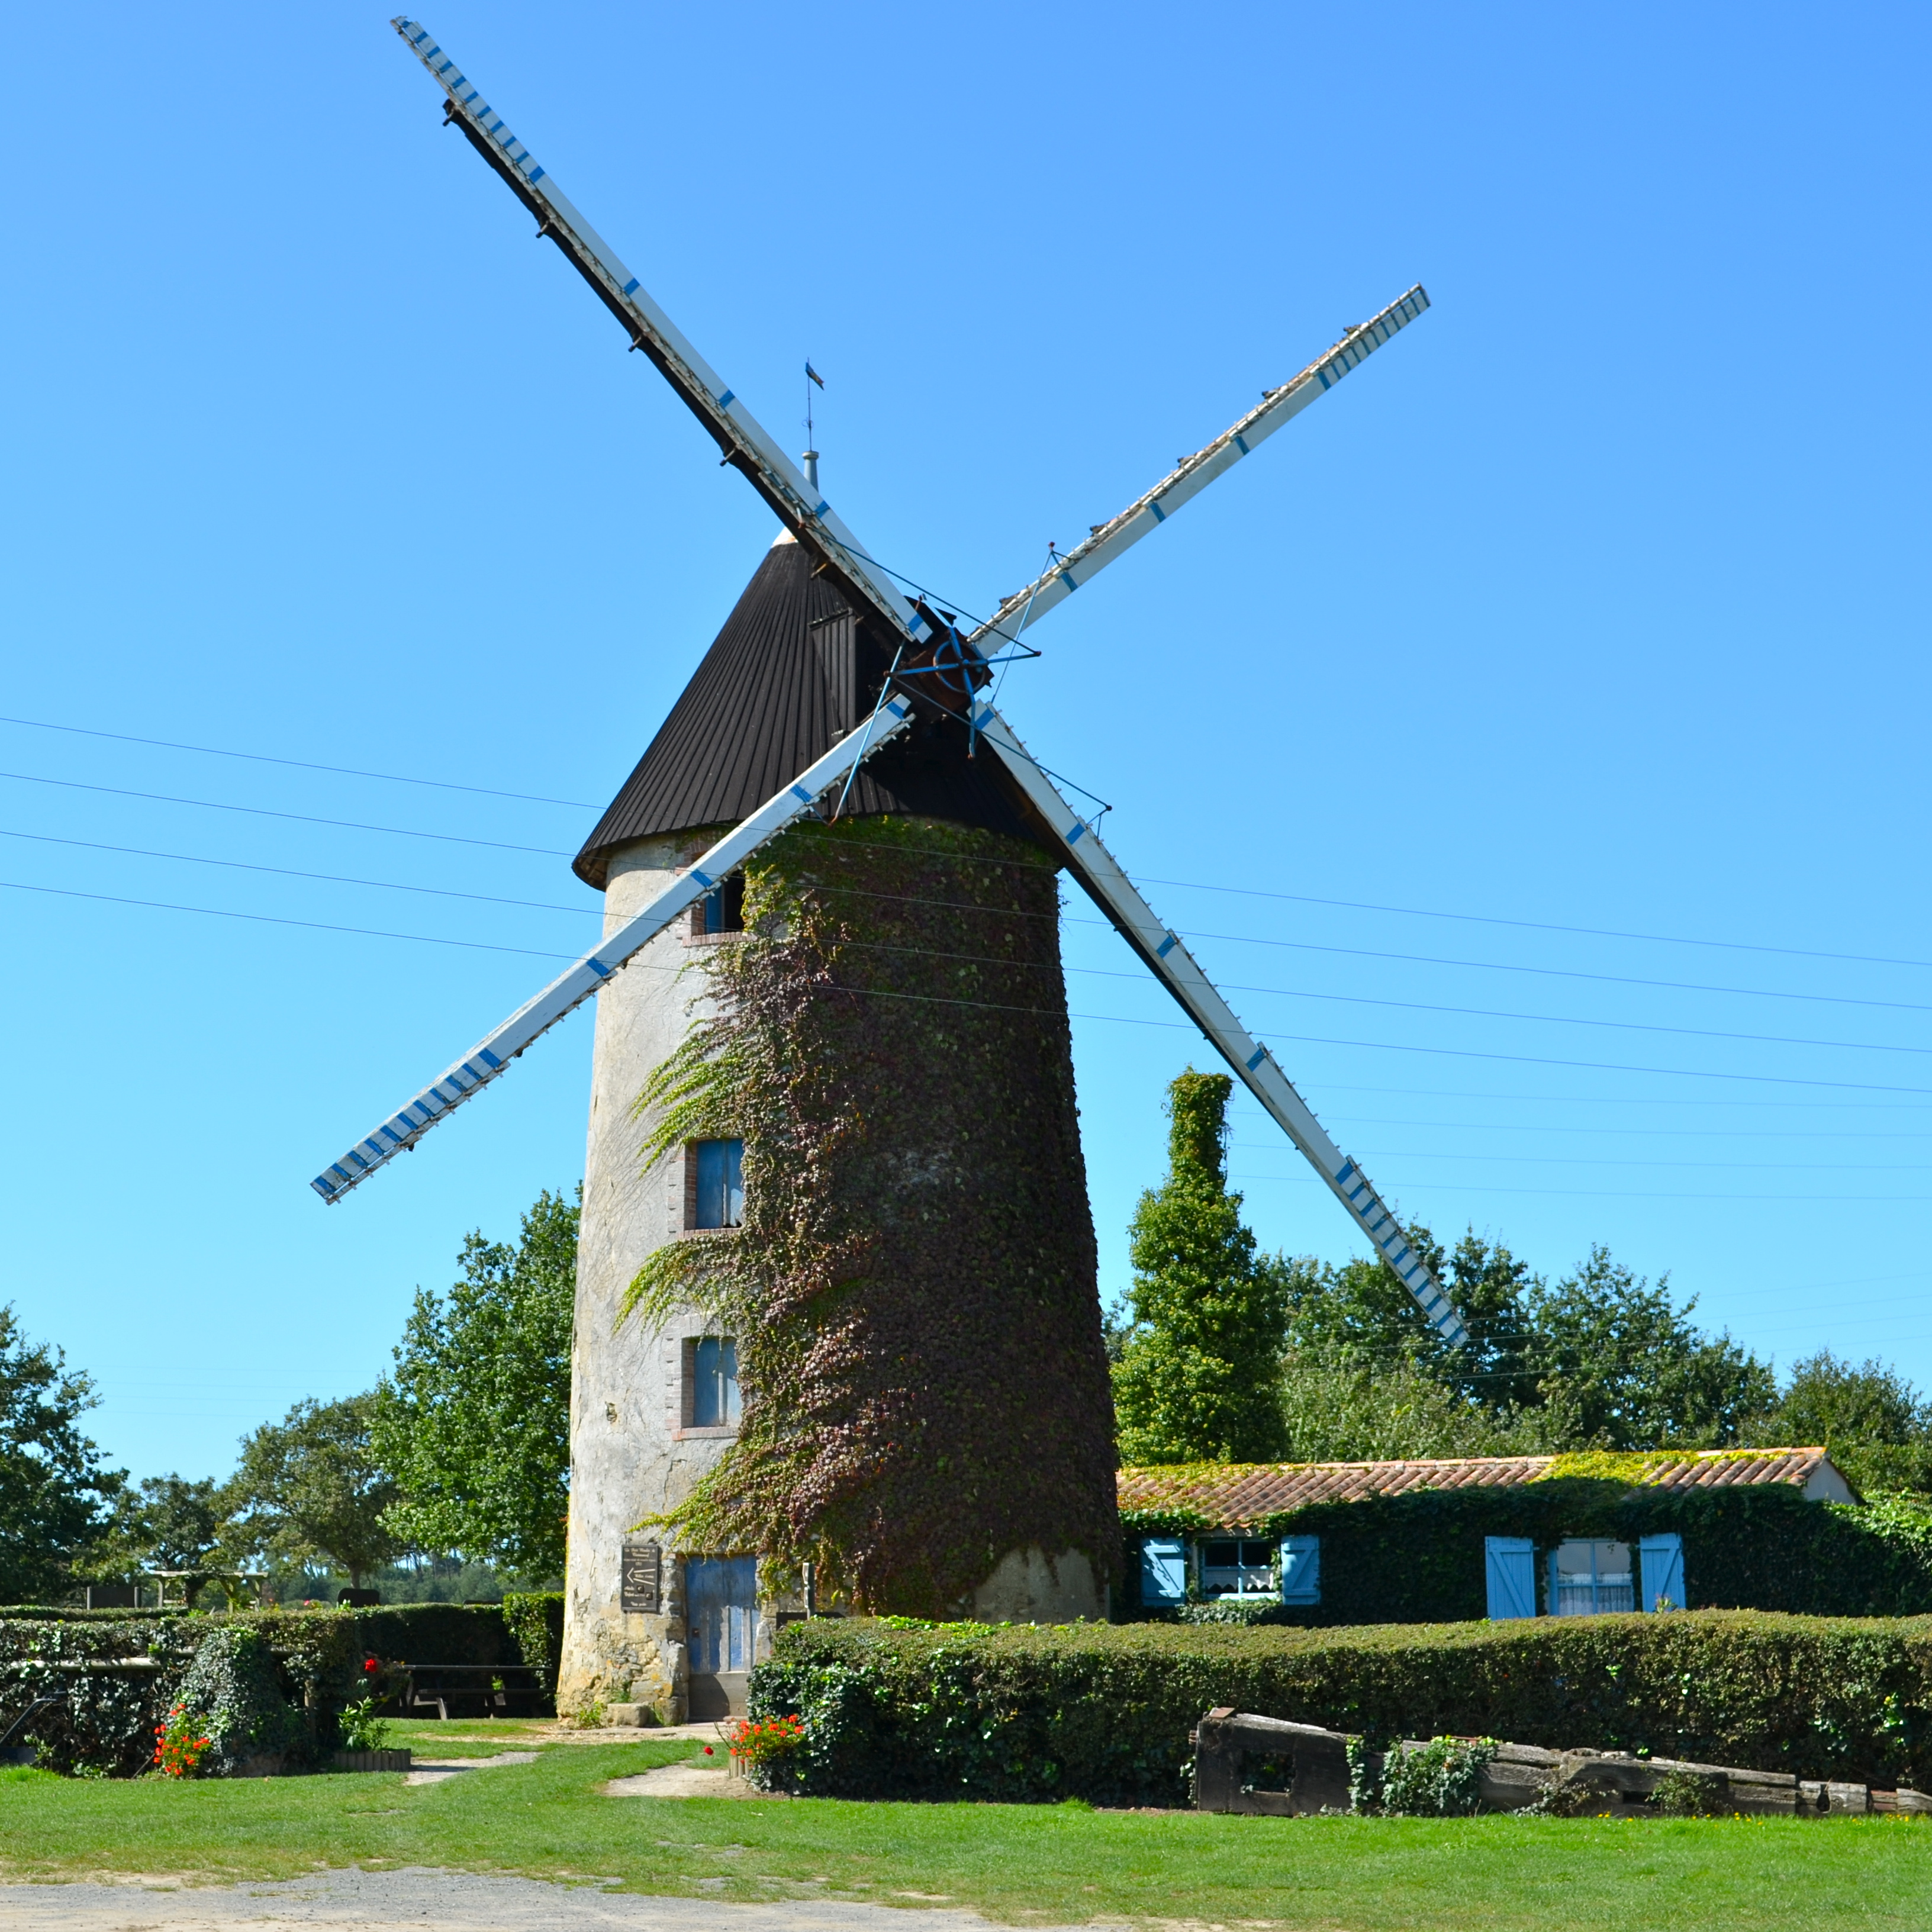 file moulin vent dit le petit moulin chateauneuf vend e jpg wikimedia commons. Black Bedroom Furniture Sets. Home Design Ideas